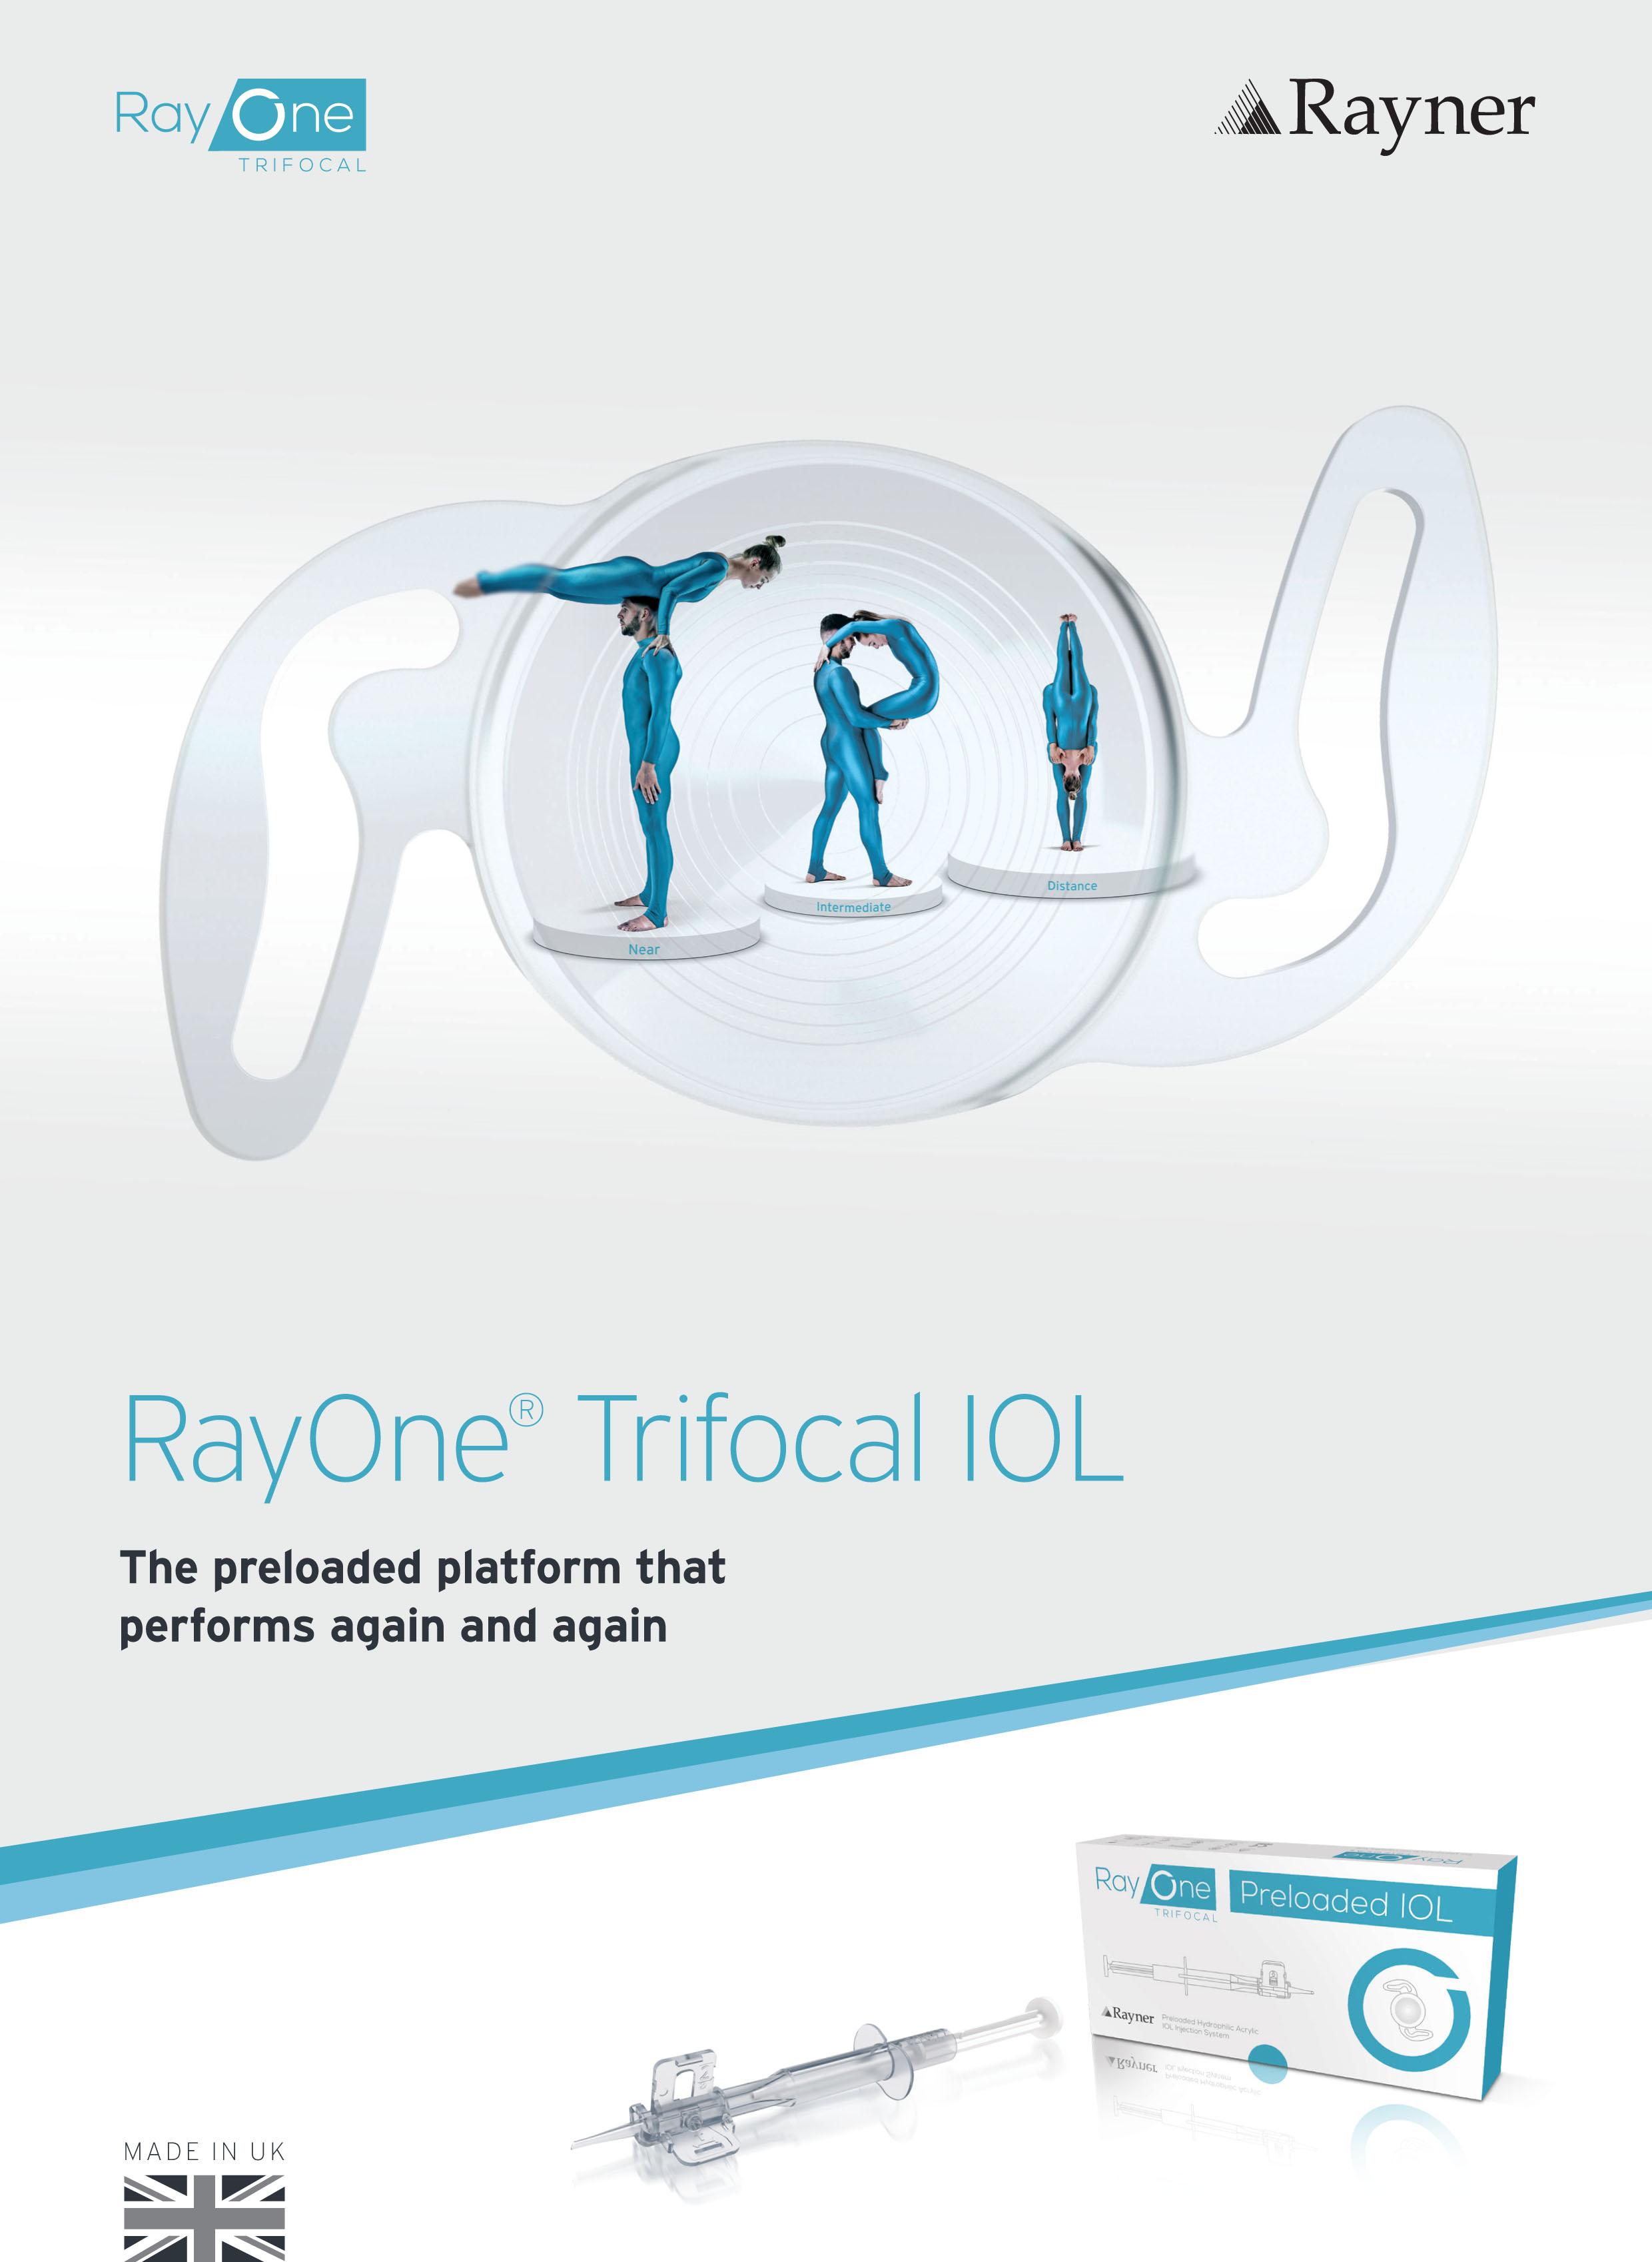 RayOne-TriFocal-Brochure-V4-1.jpg